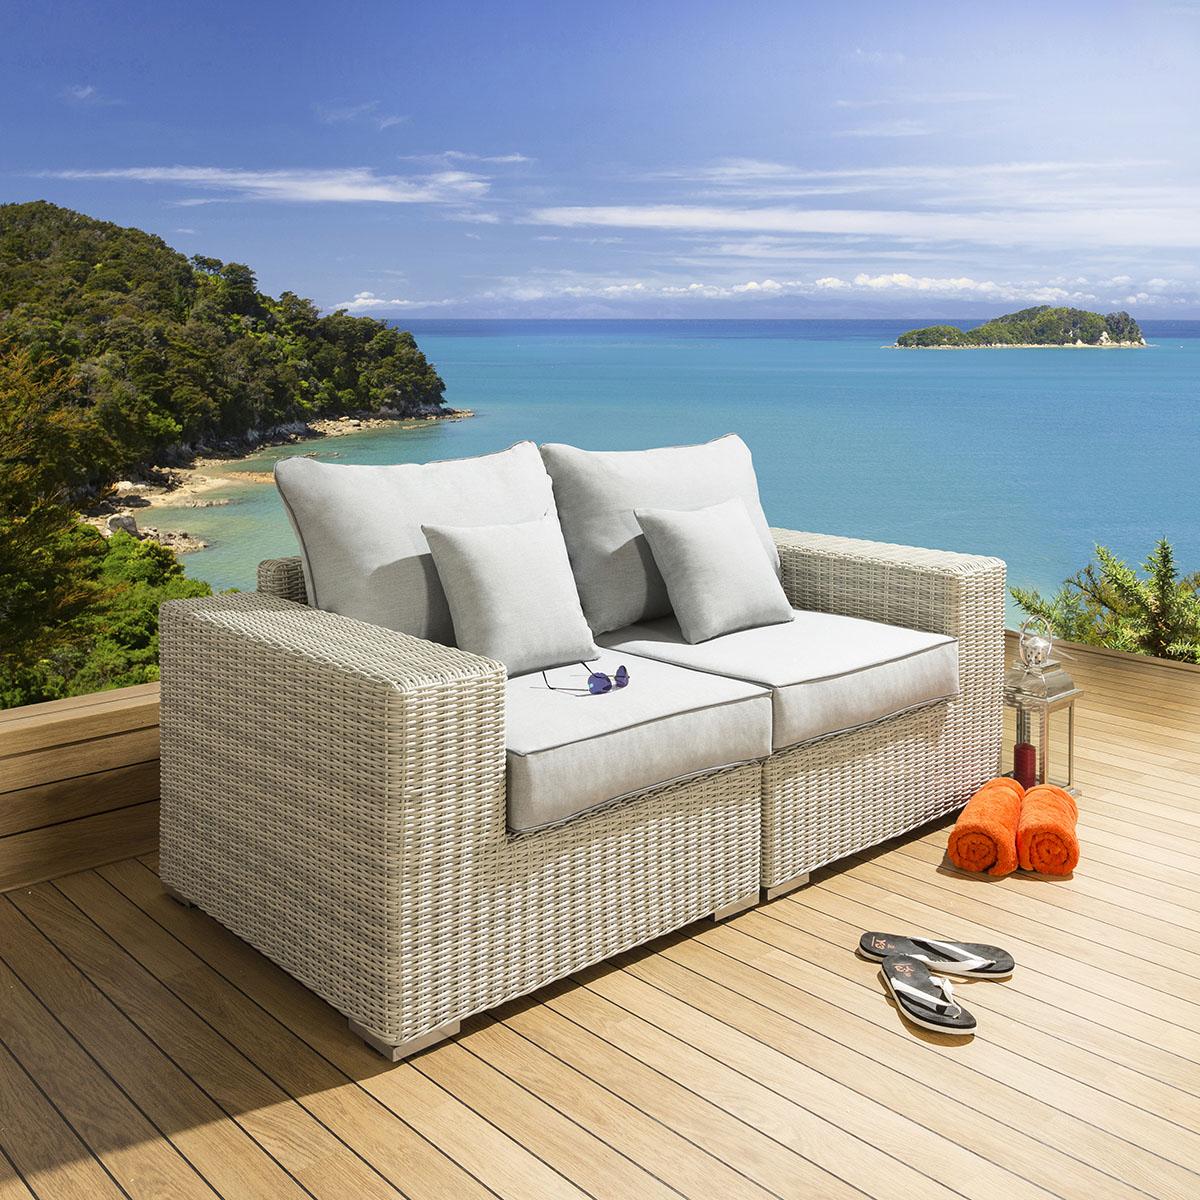 Sentinel Quatropi Luxury Outdoor Garden 2 Seater Sofa Stone Rattan / Grey S2